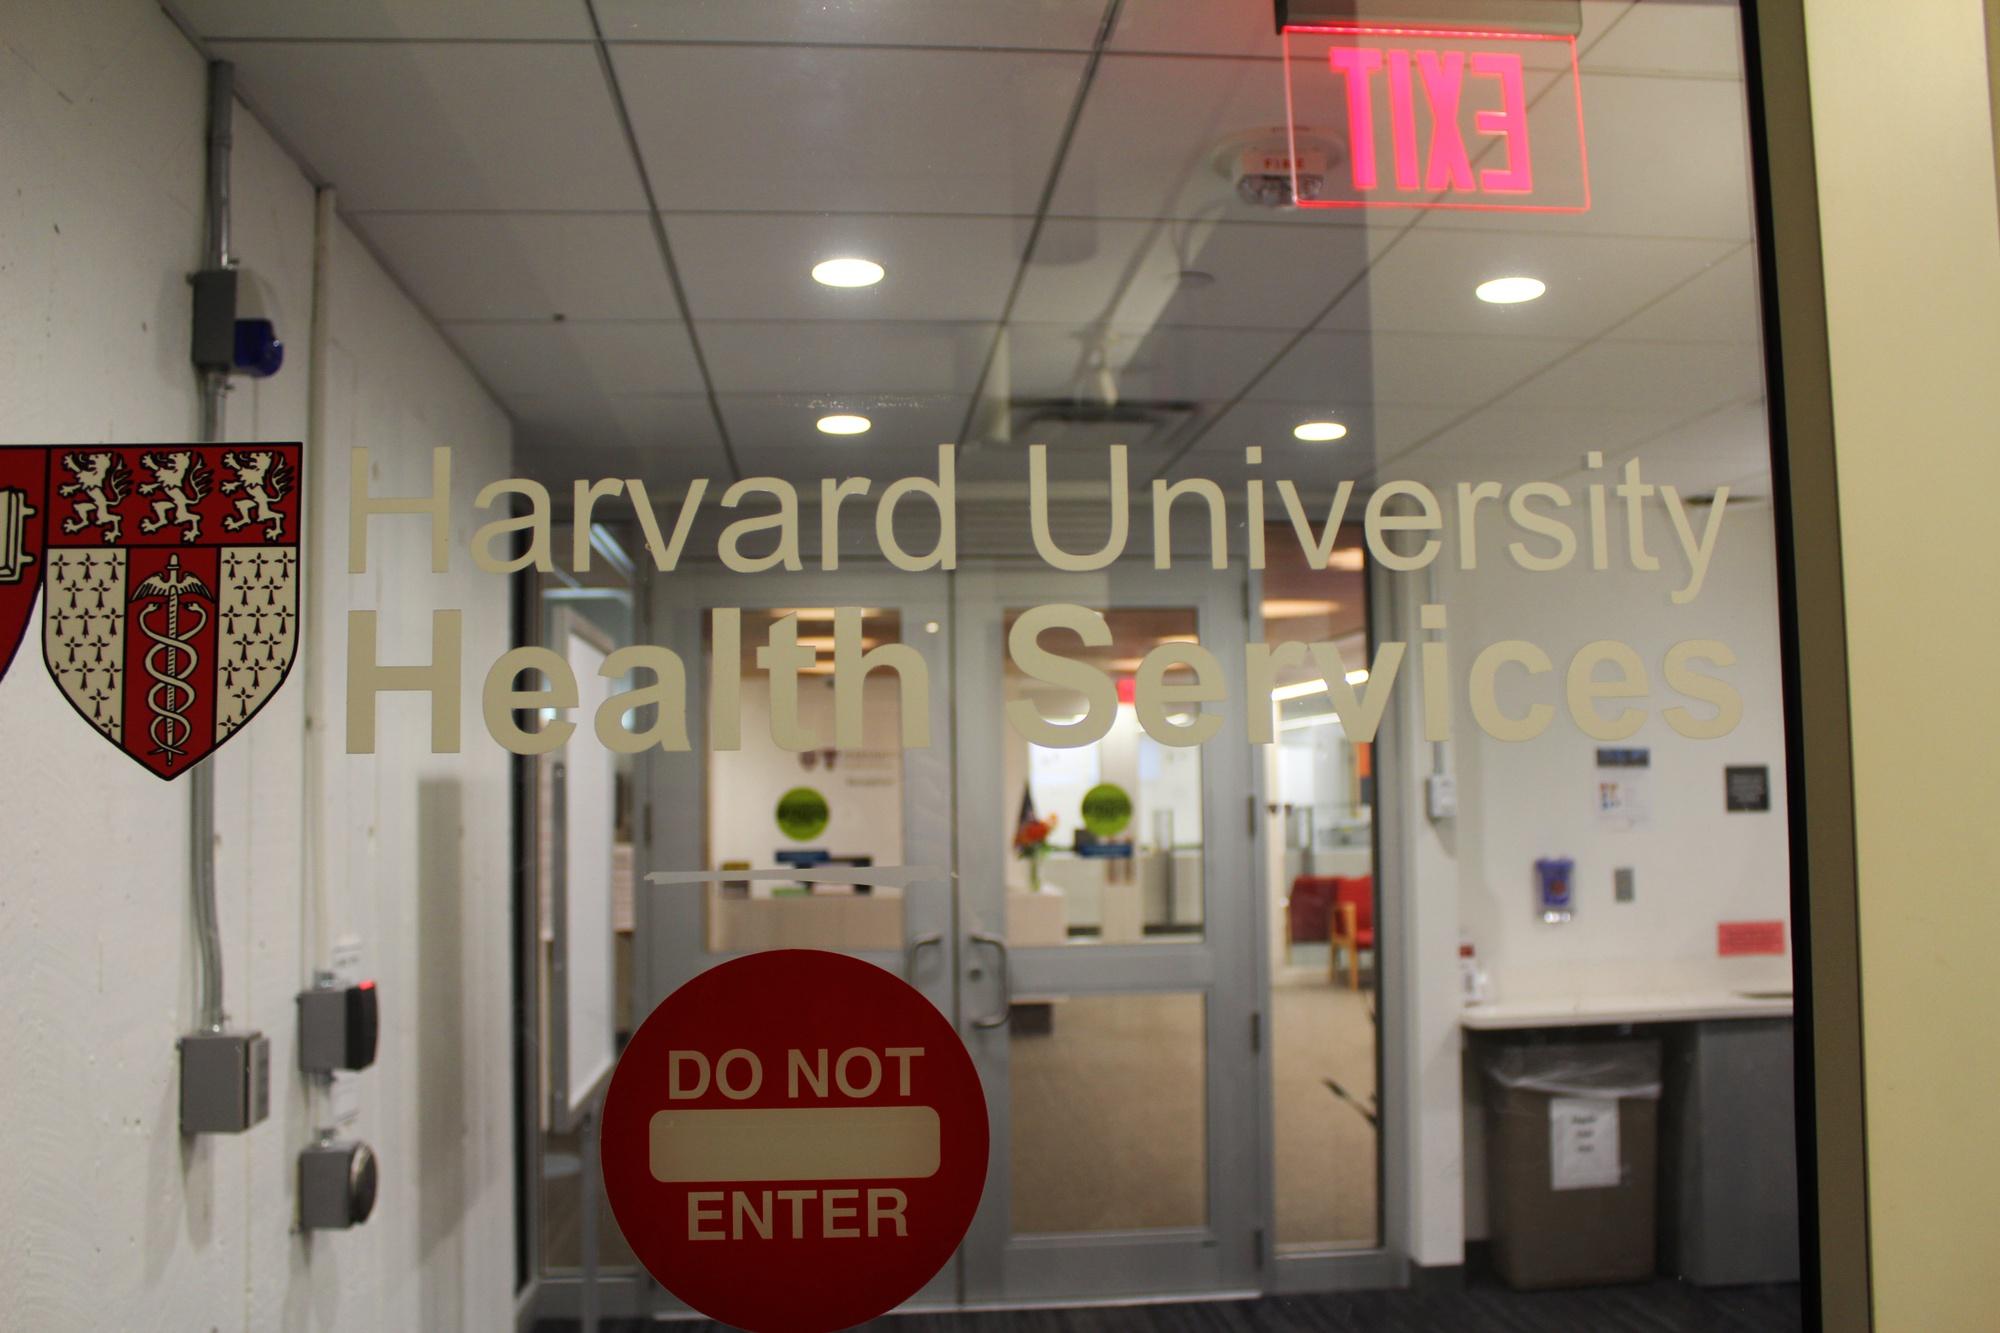 Harvard University Health Services provides medical care to University affiliates.